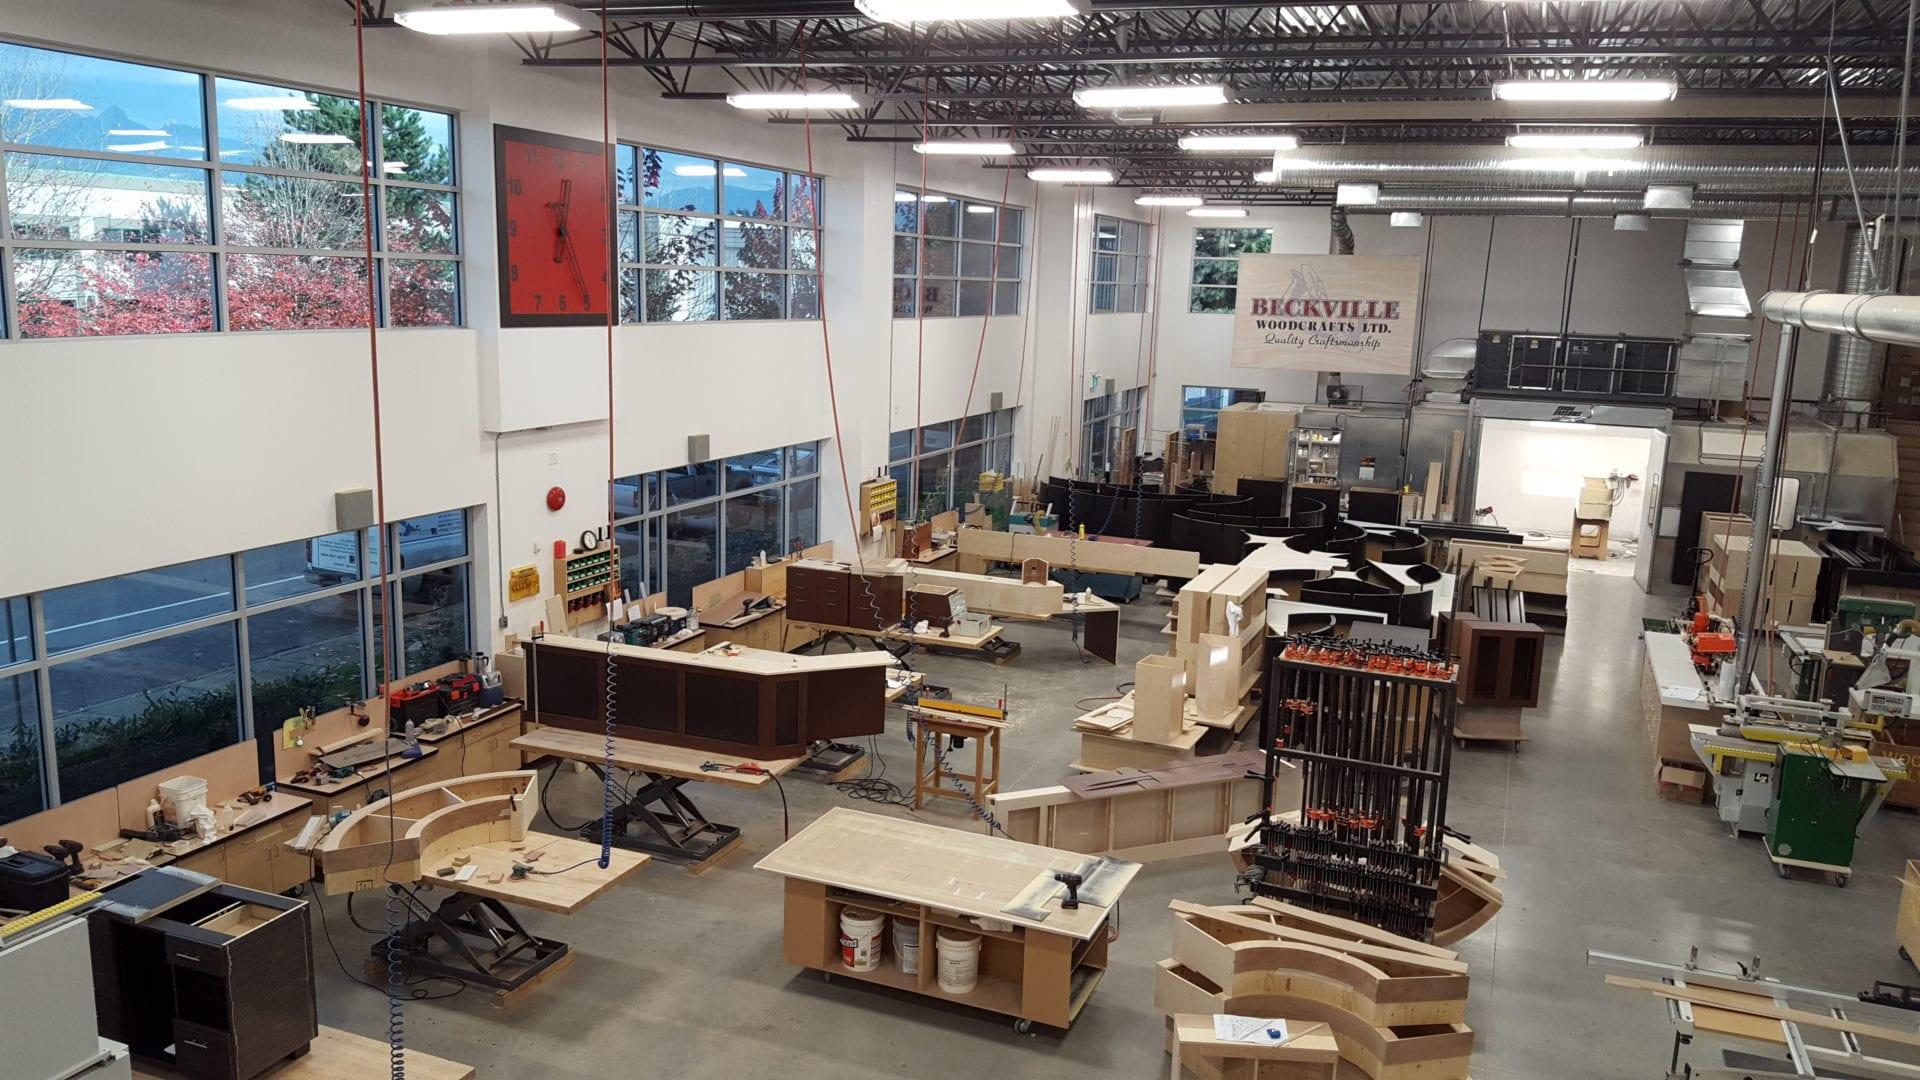 Beckville Woodcrafts Ltd